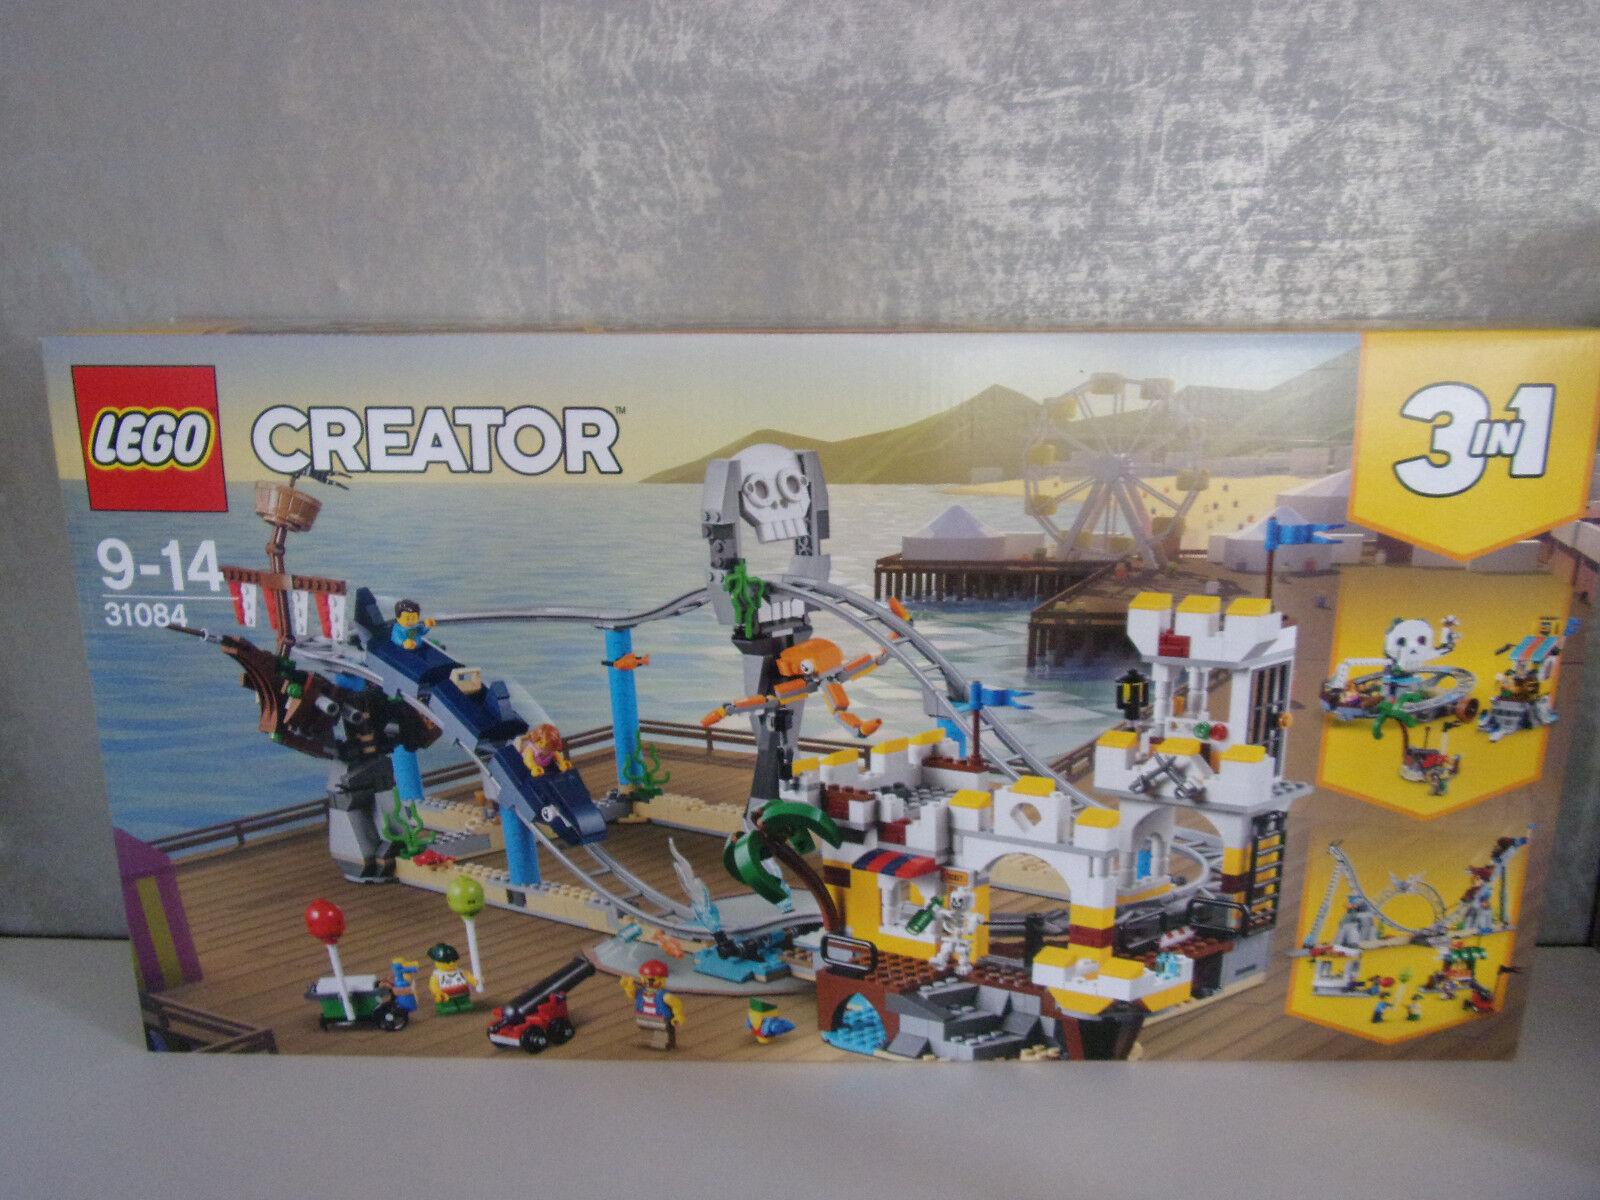 Lego Creator (3in1) 31084 Piraten-Achterbahn - Nip